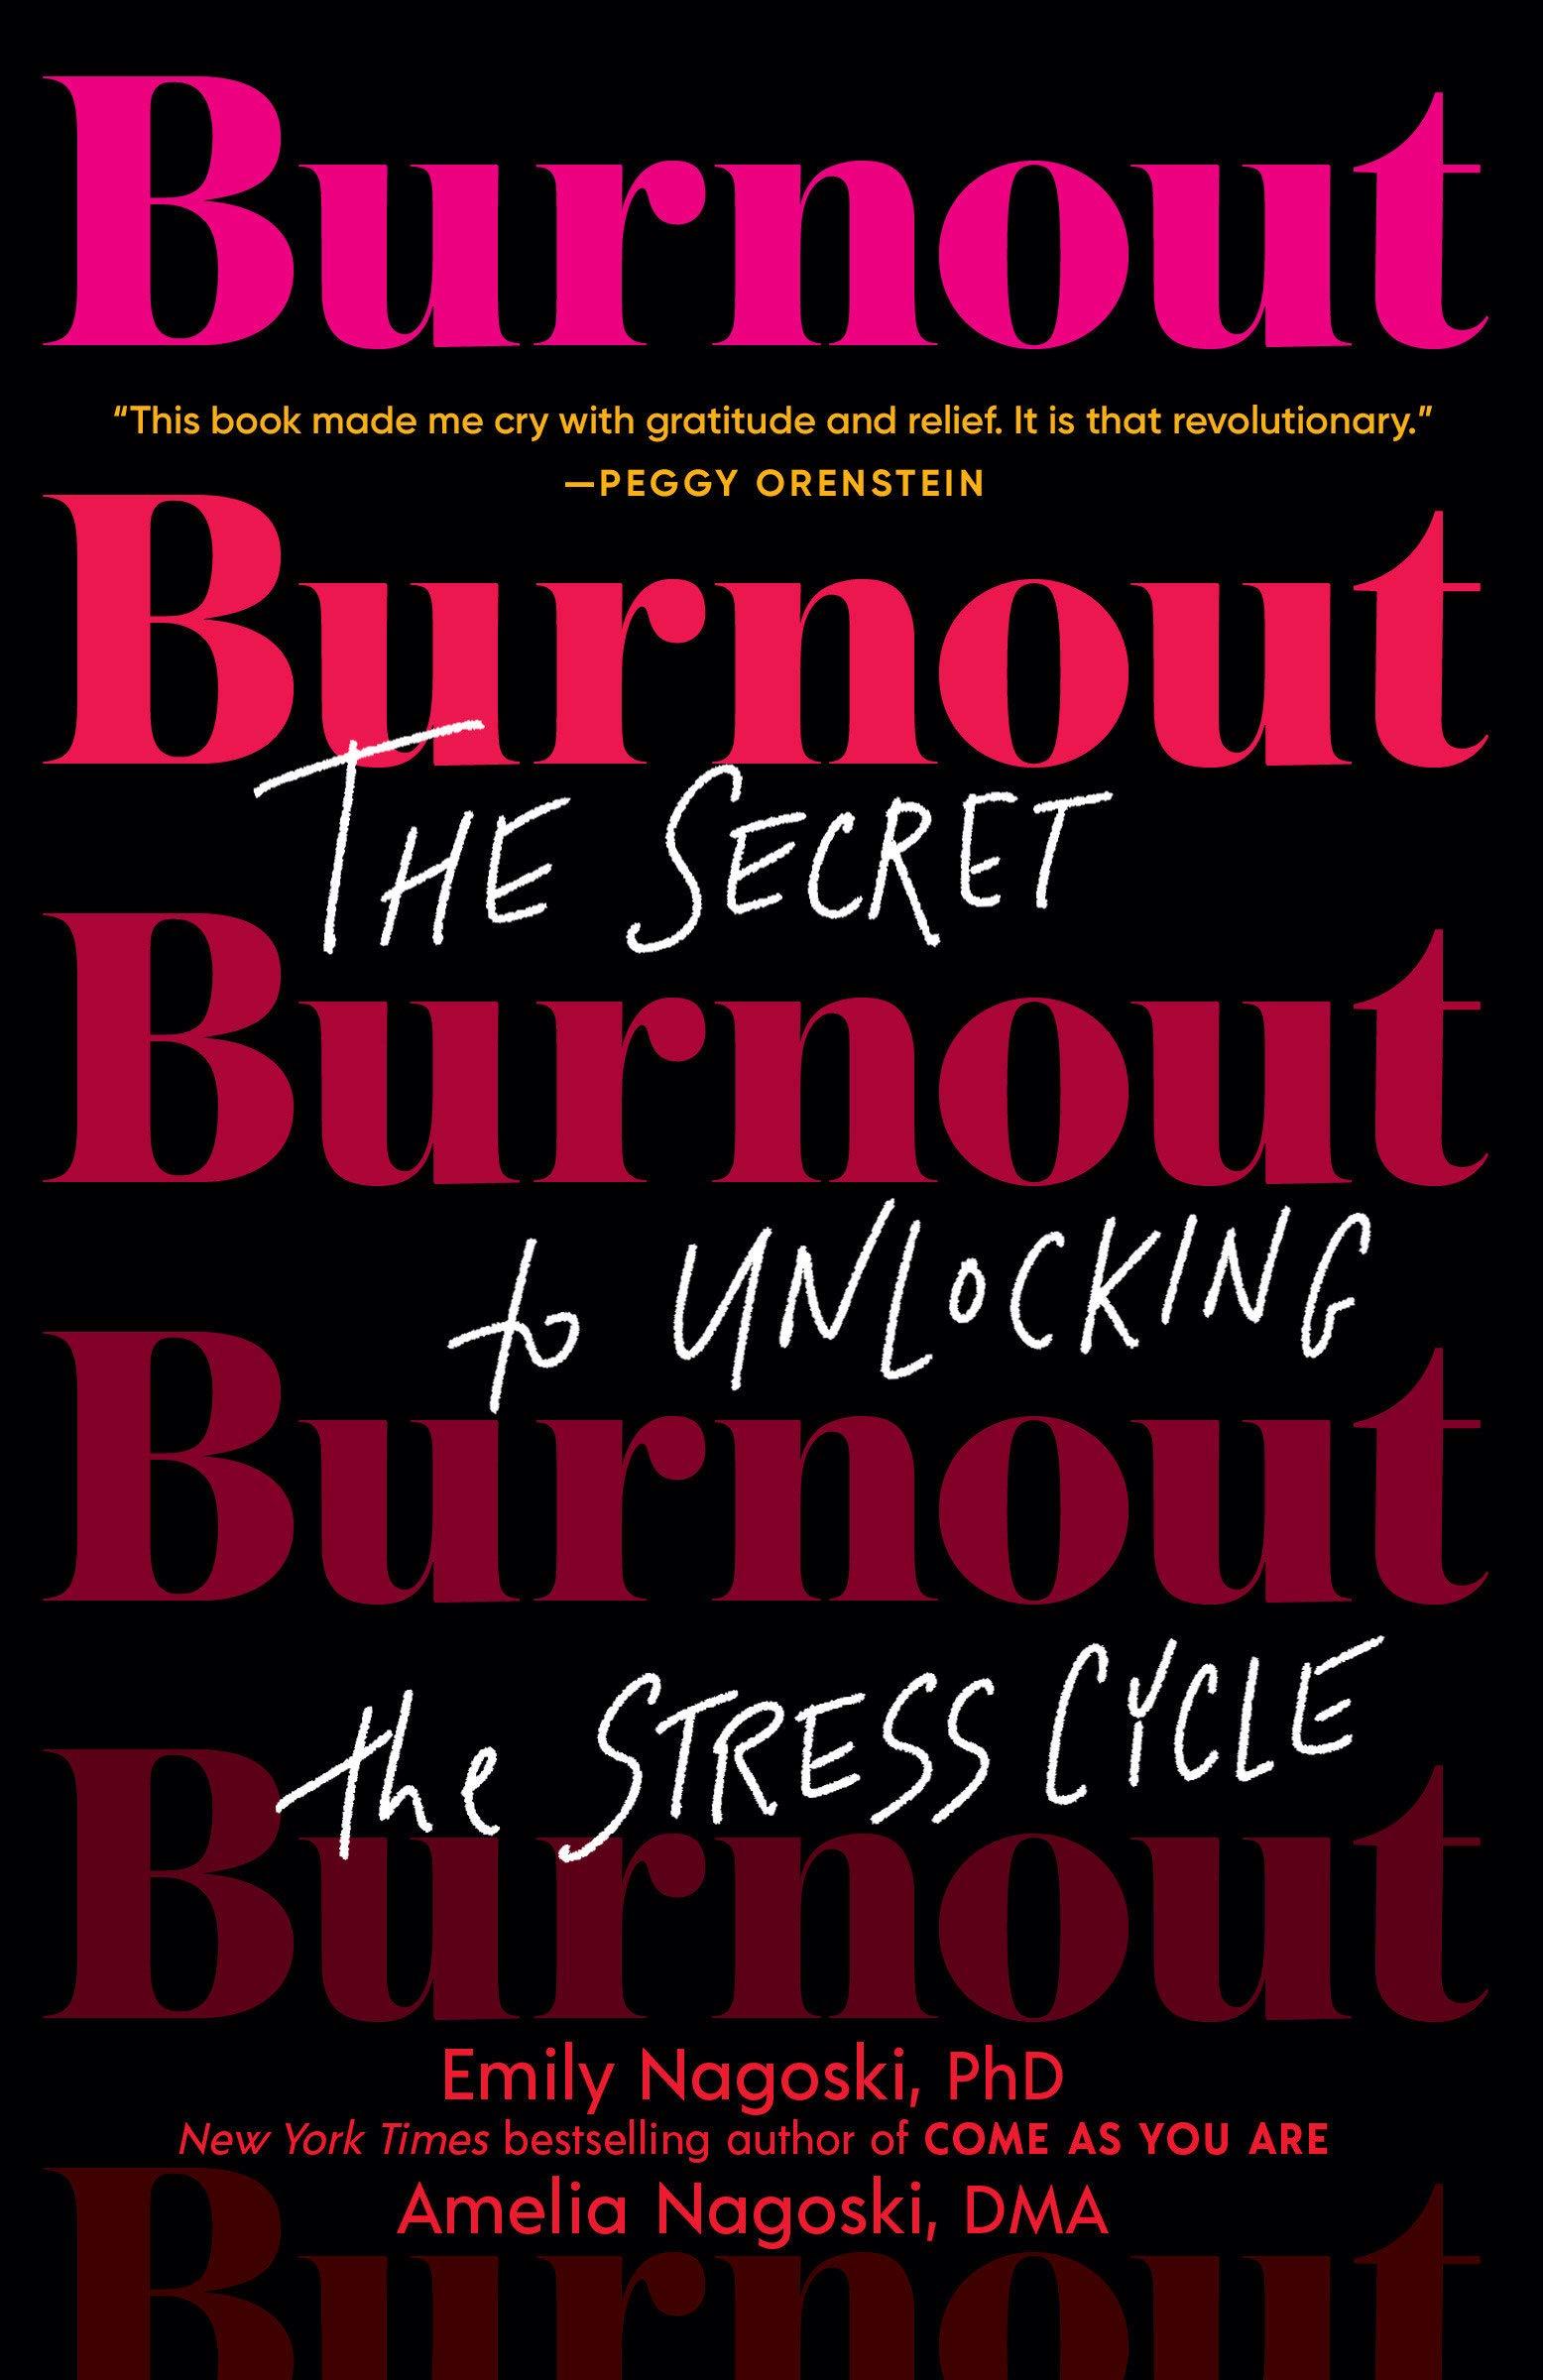 Burnout: The Secret to Unlocking the Stress Cycle: Nagoski PhD, Emily,  Nagoski DMA, Amelia: 9781984818324: Amazon.com: Books